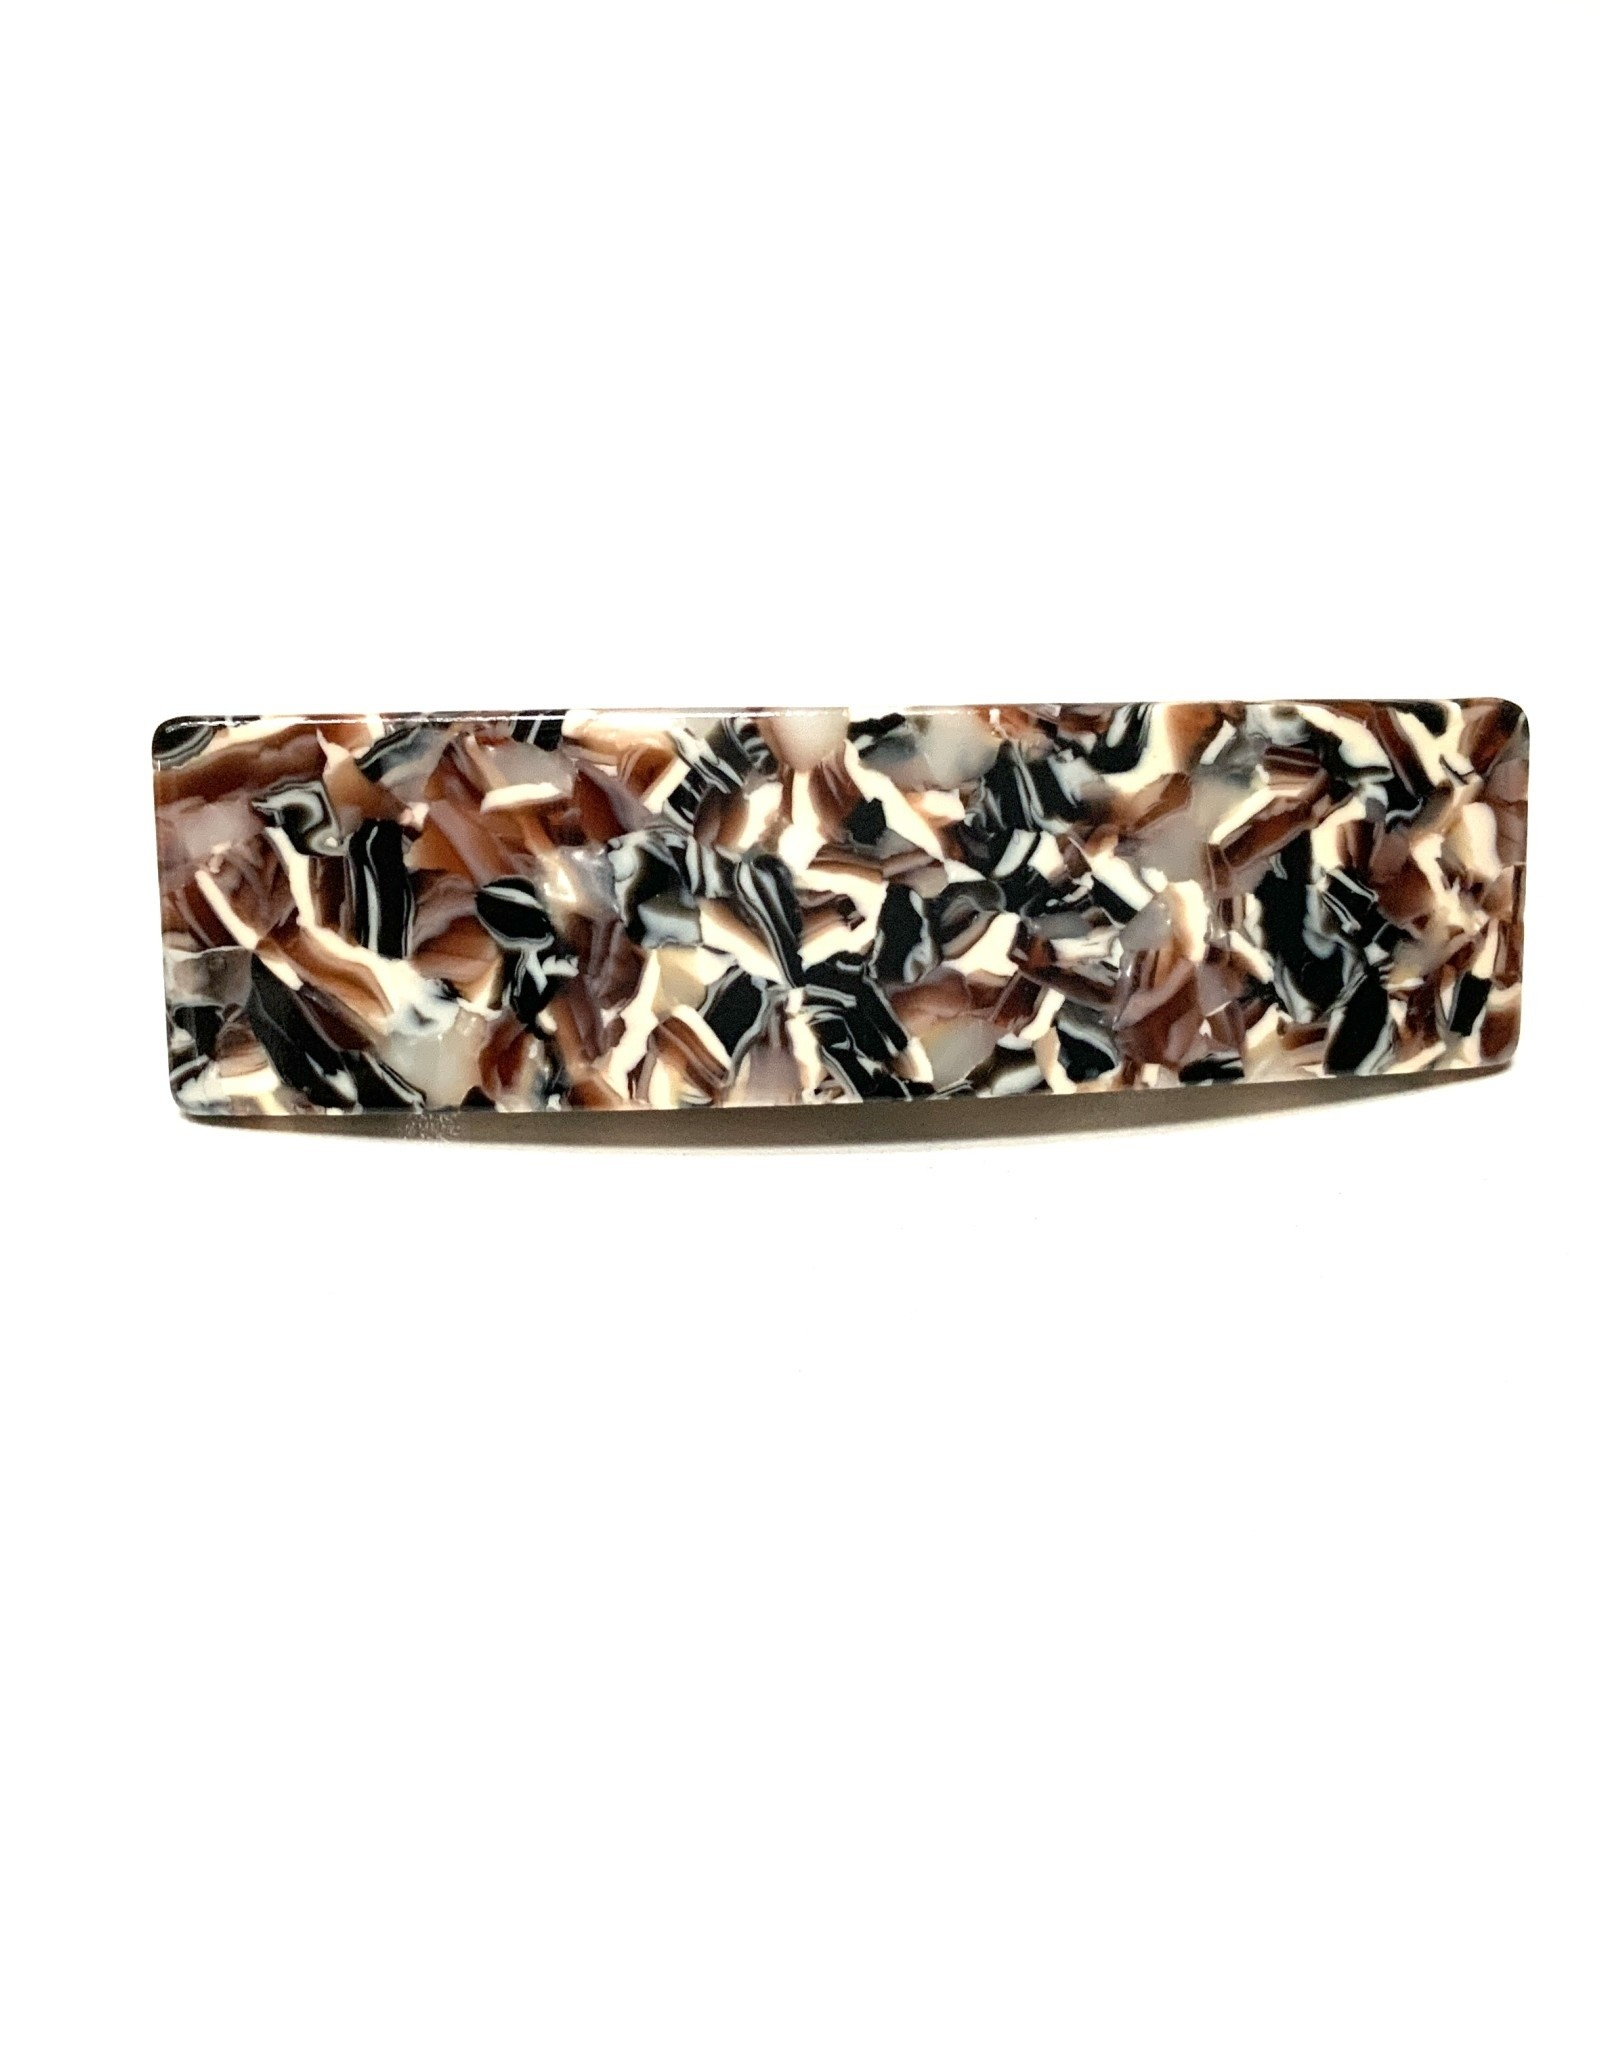 Young & Heart Resin Hair Barrette, Marble Cedar